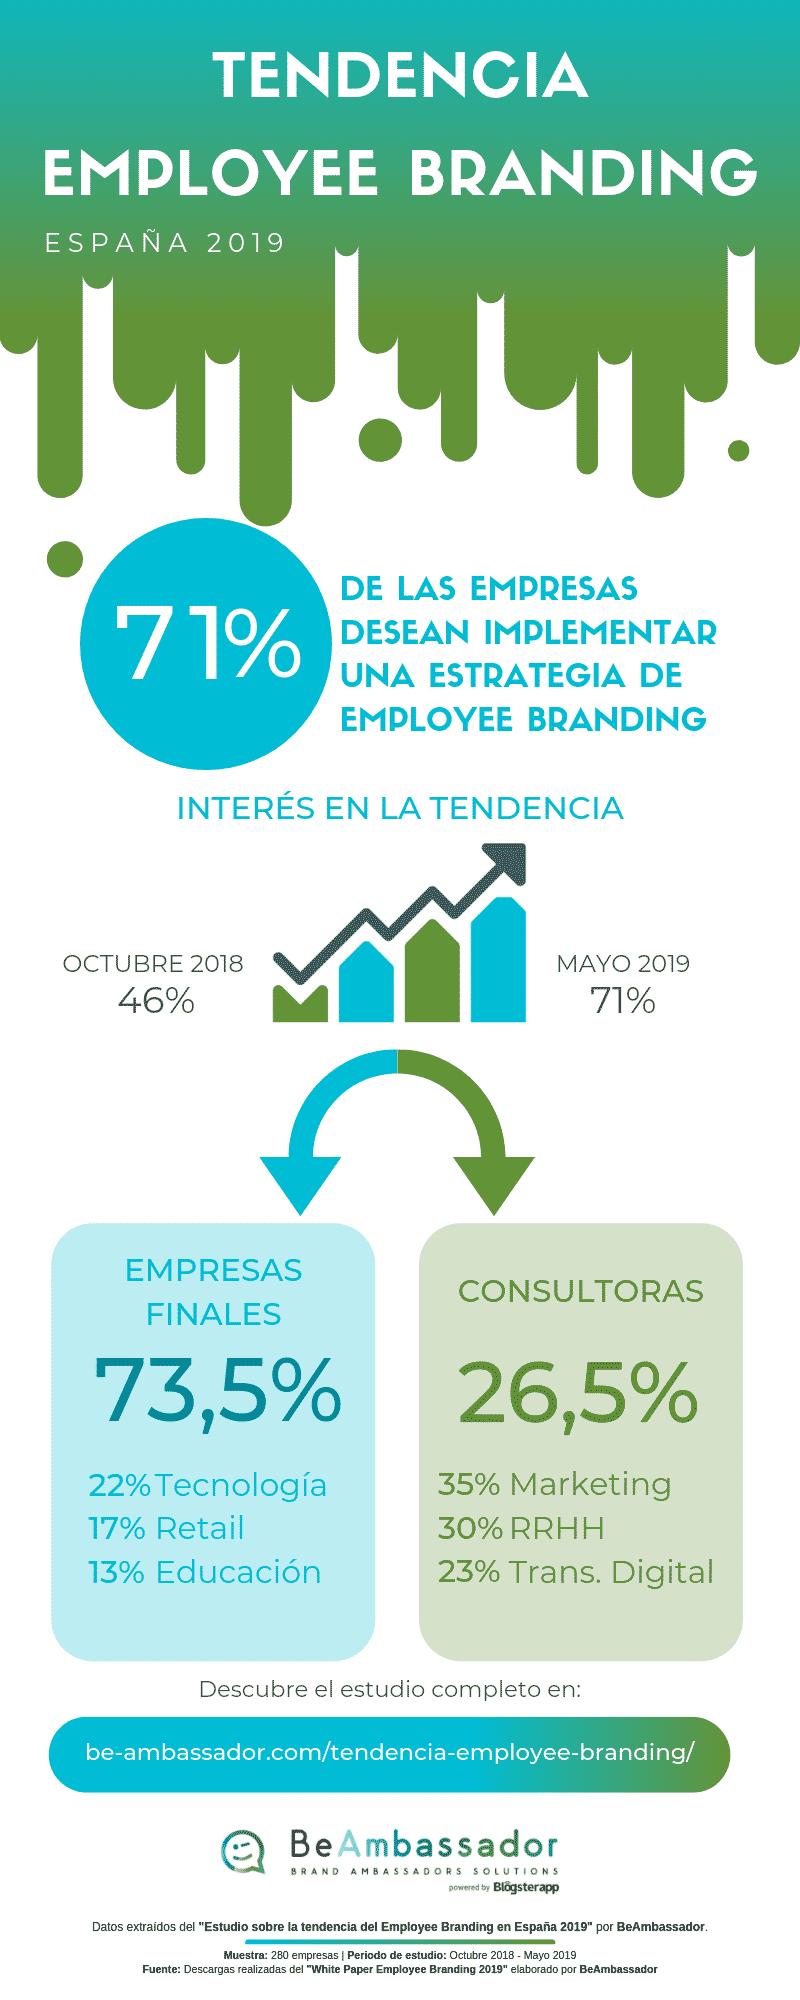 Tendencia Employee Branding